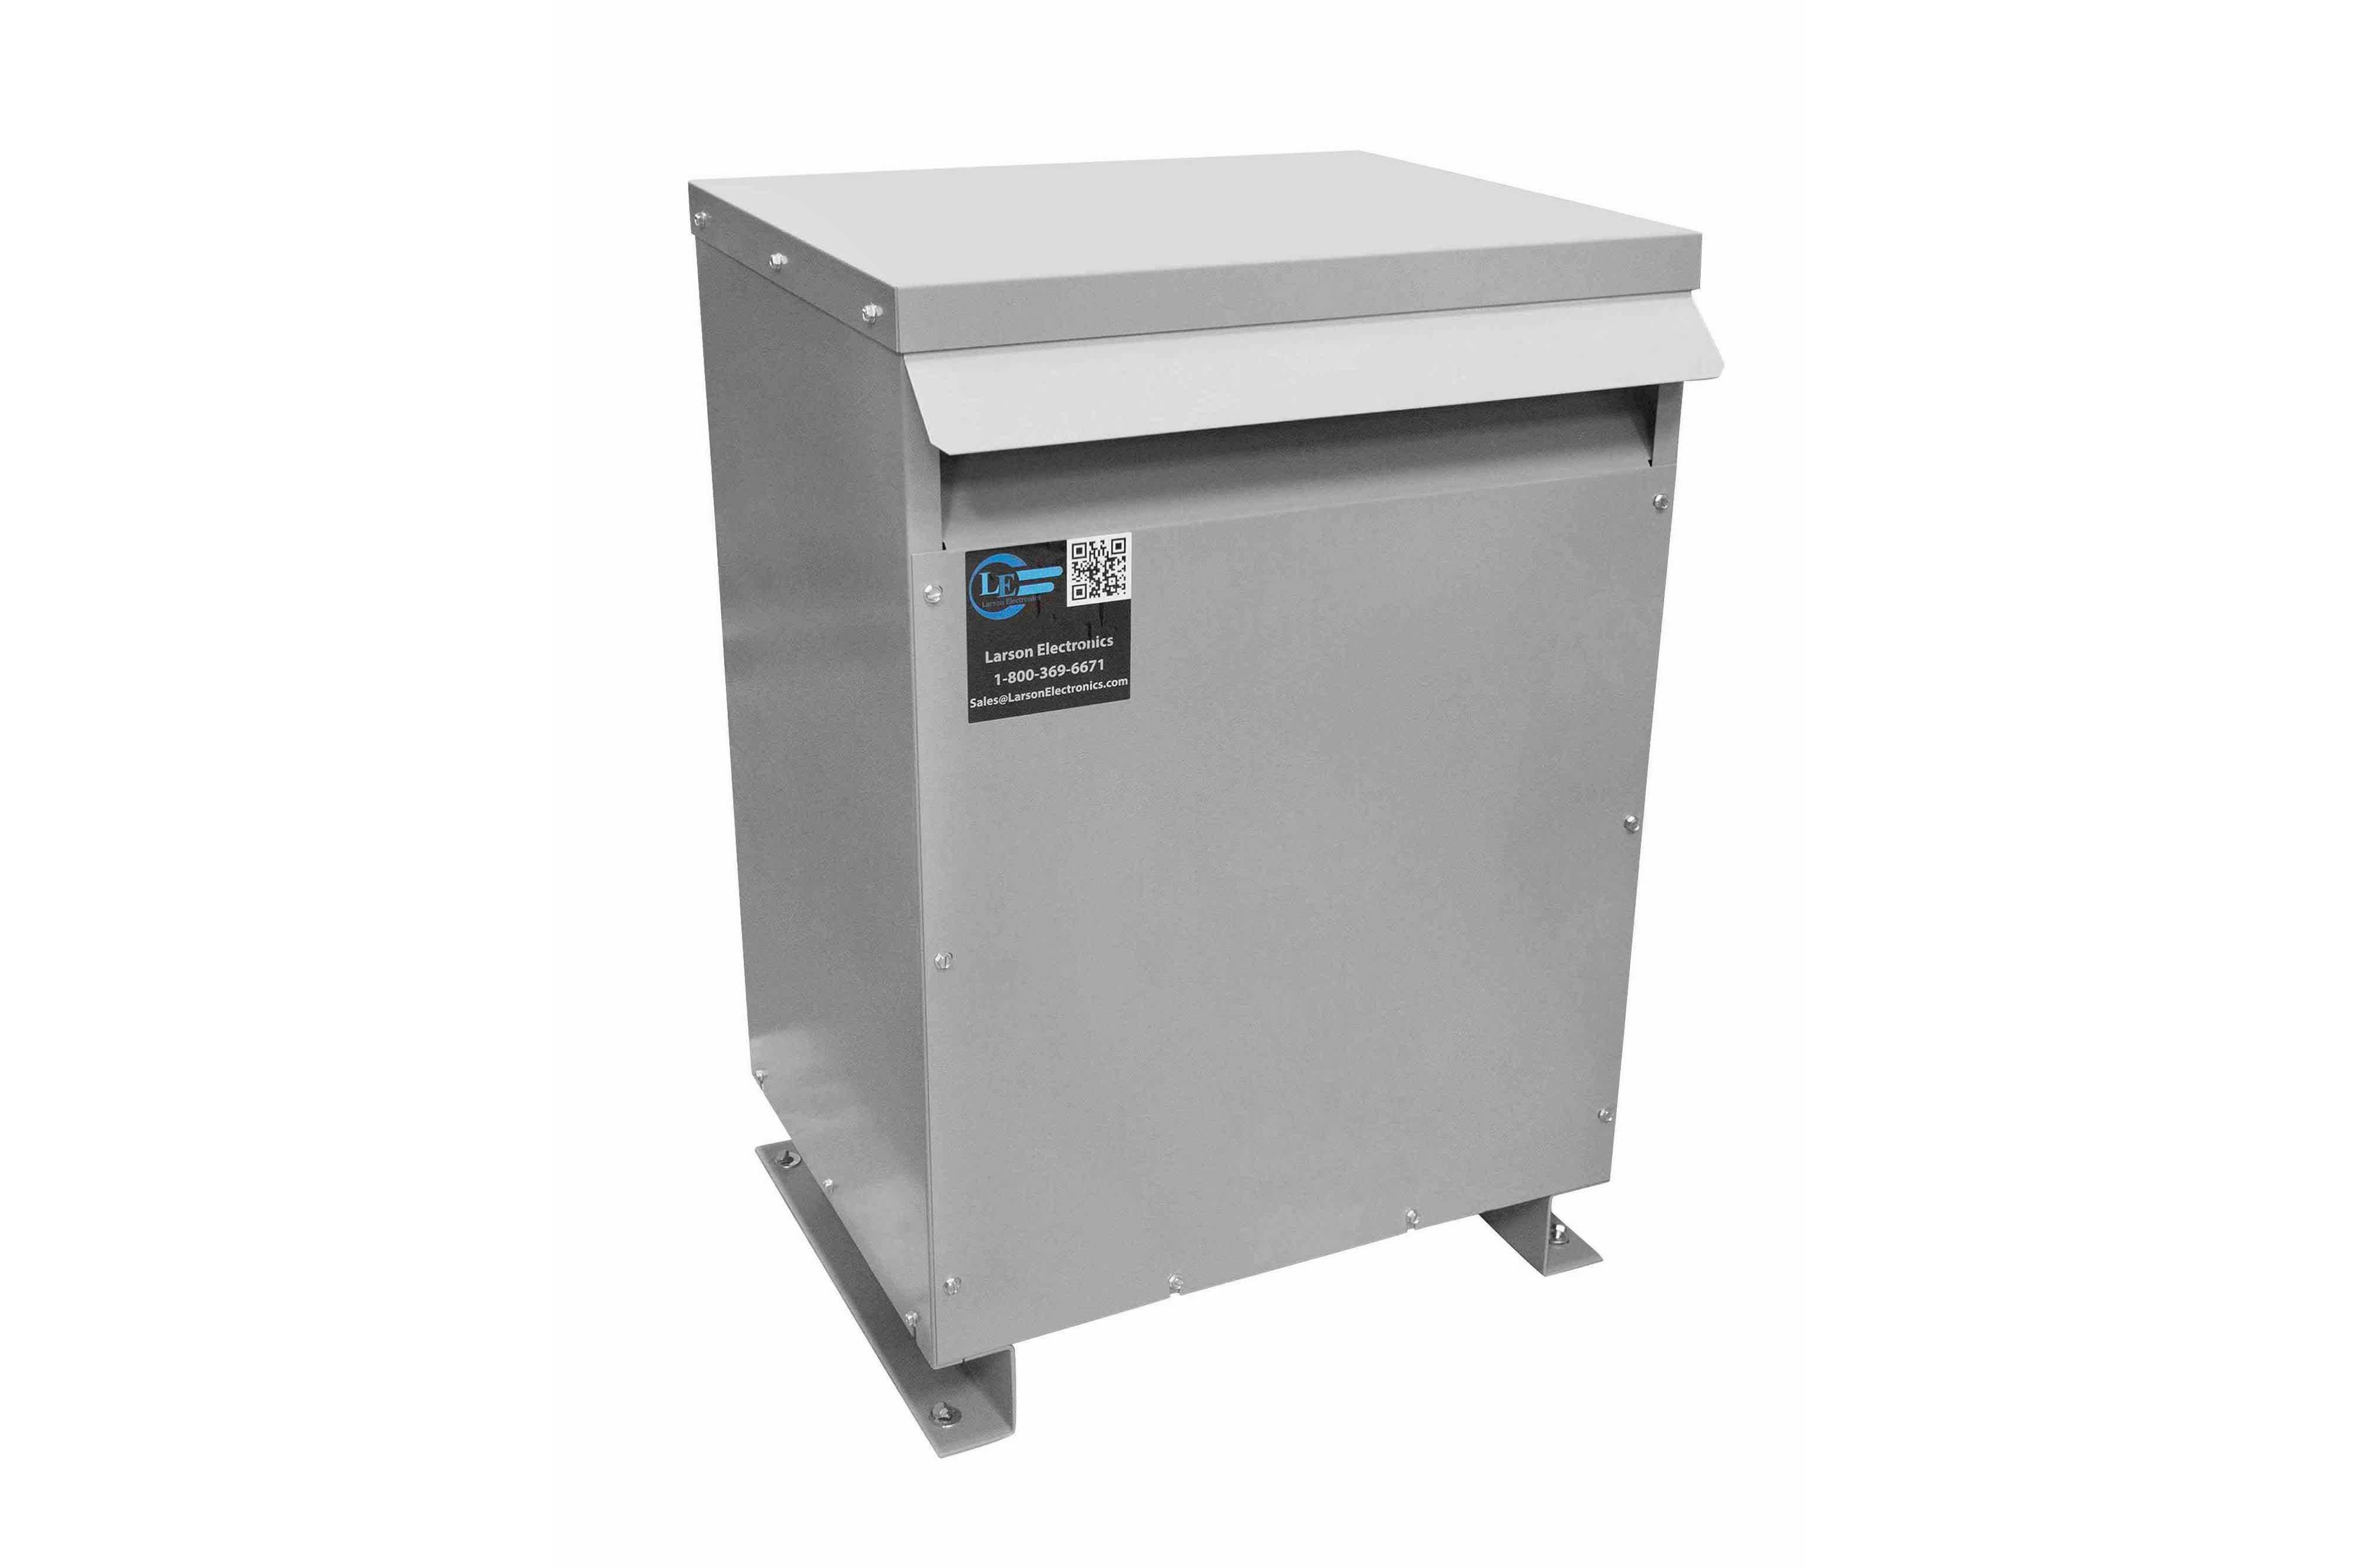 200 kVA 3PH Isolation Transformer, 400V Wye Primary, 600Y/347 Wye-N Secondary, N3R, Ventilated, 60 Hz